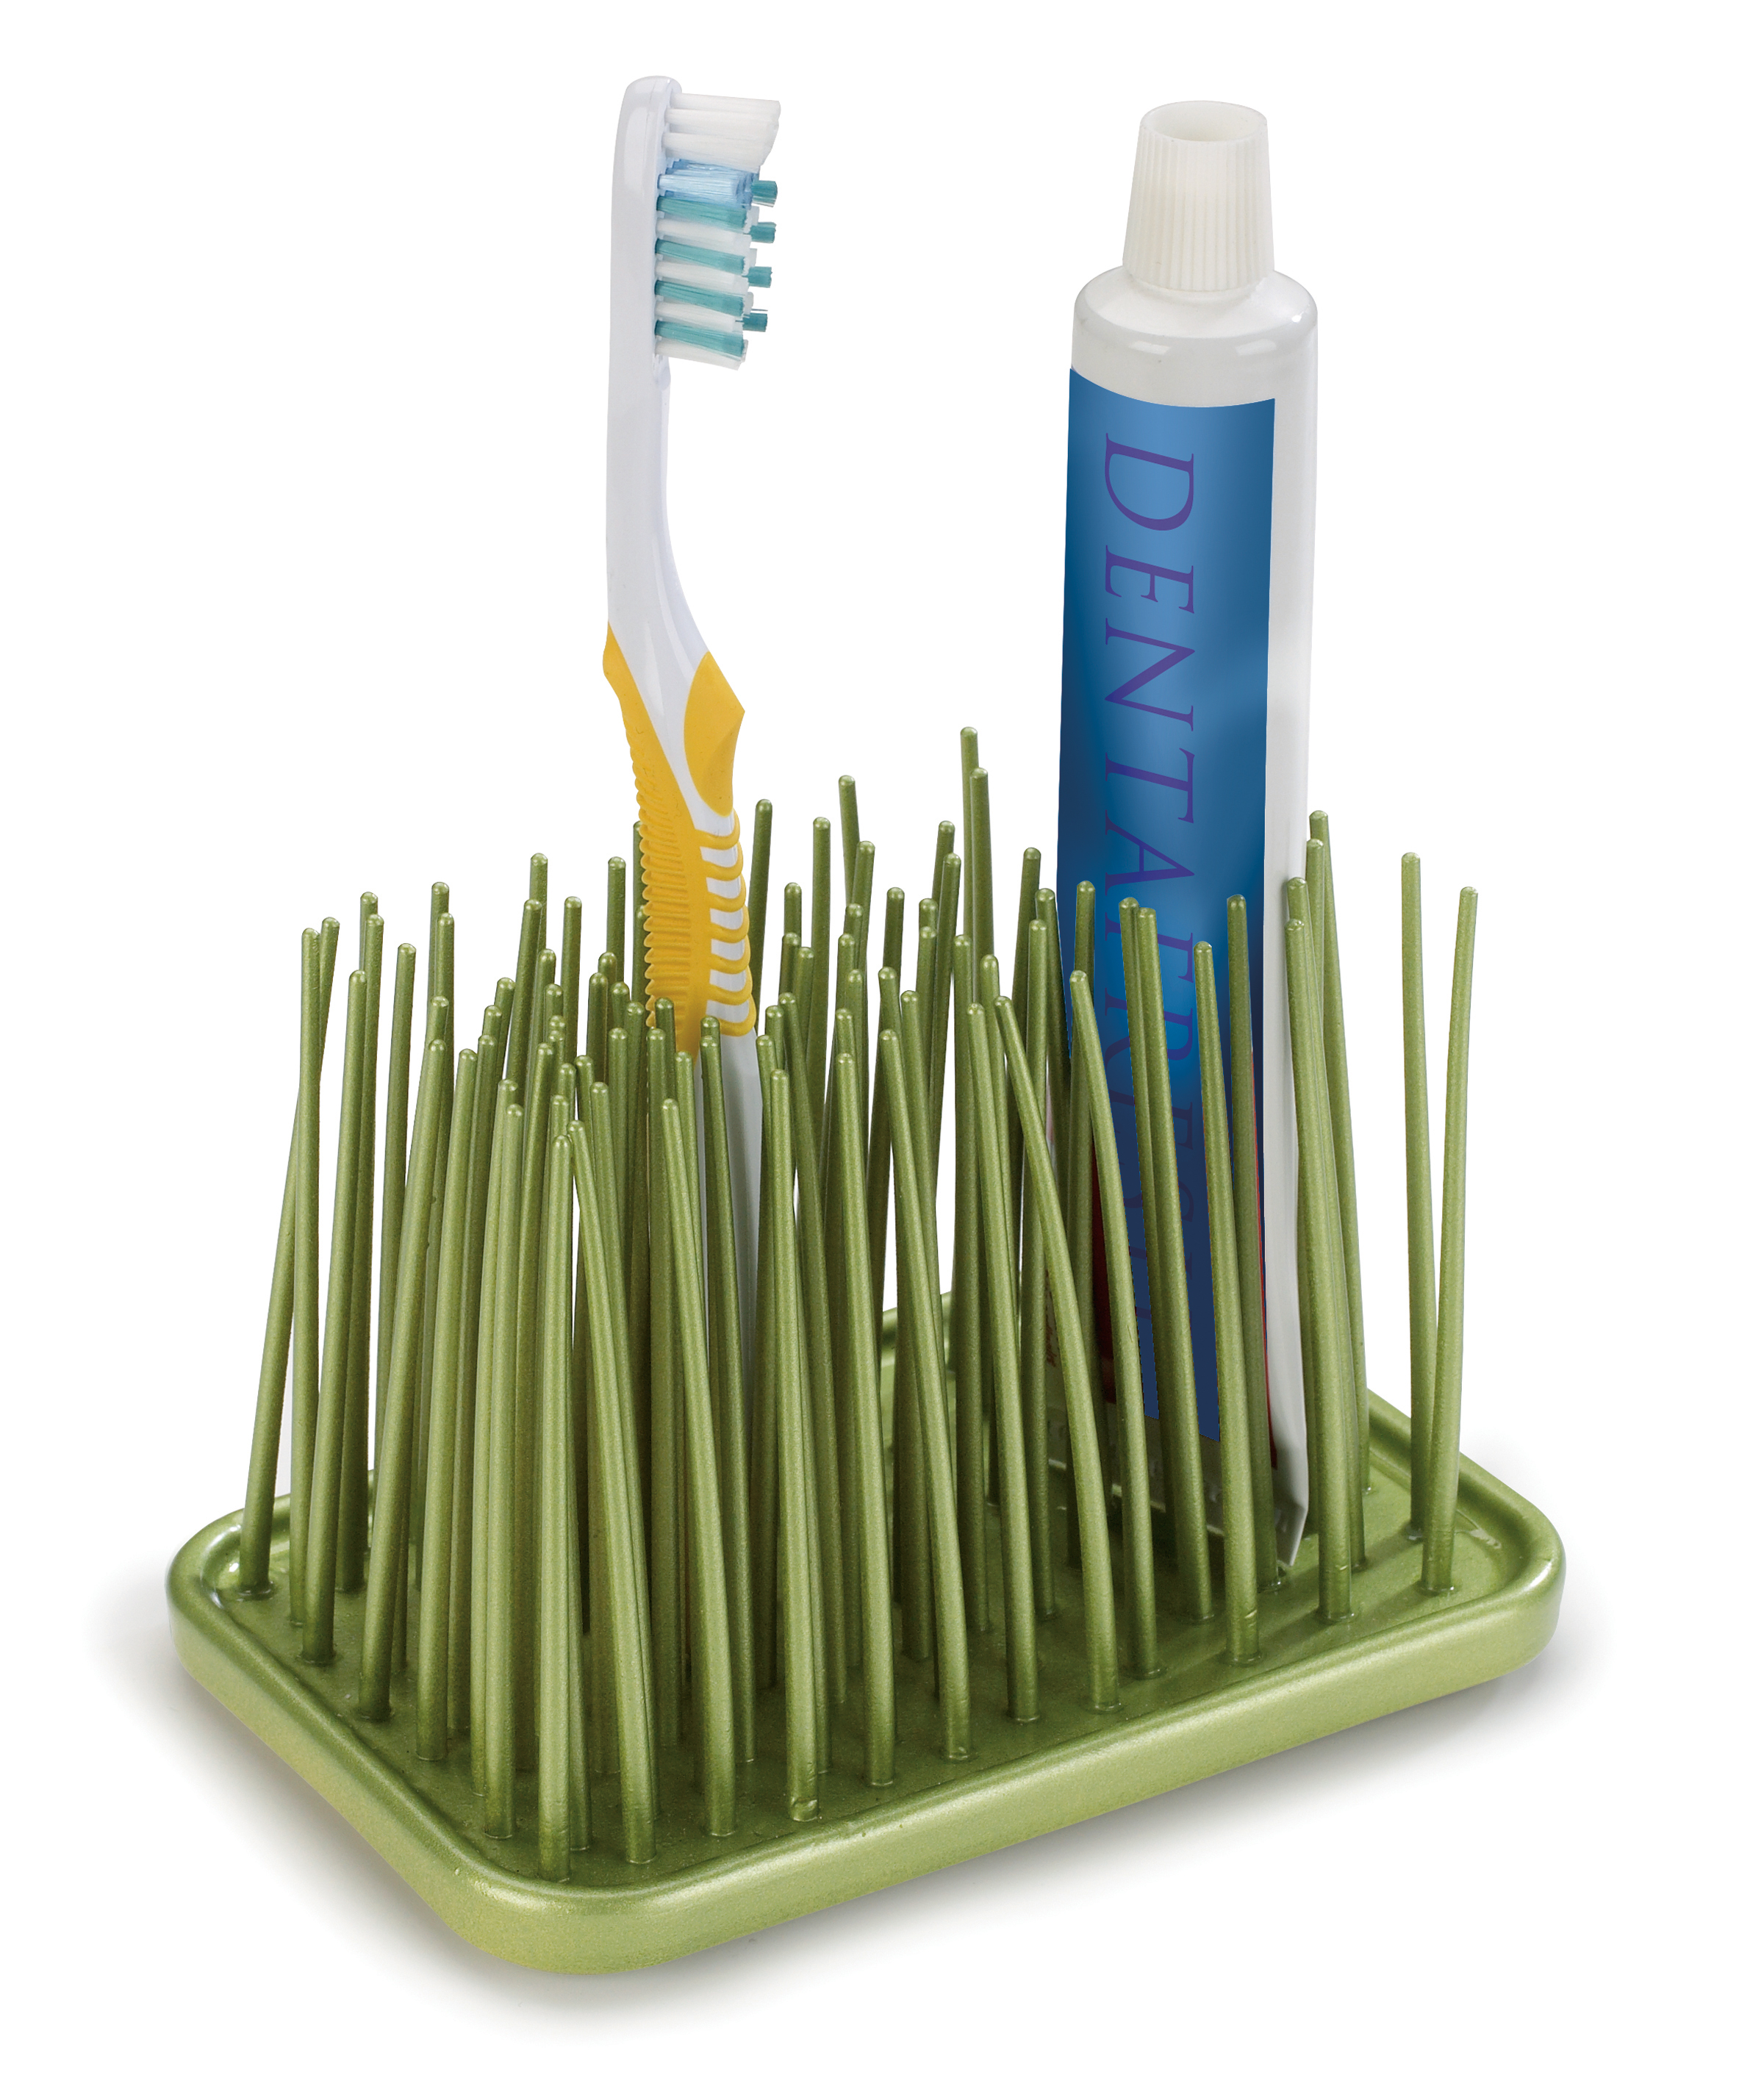 Grassy Toothbrush Organizer - $9